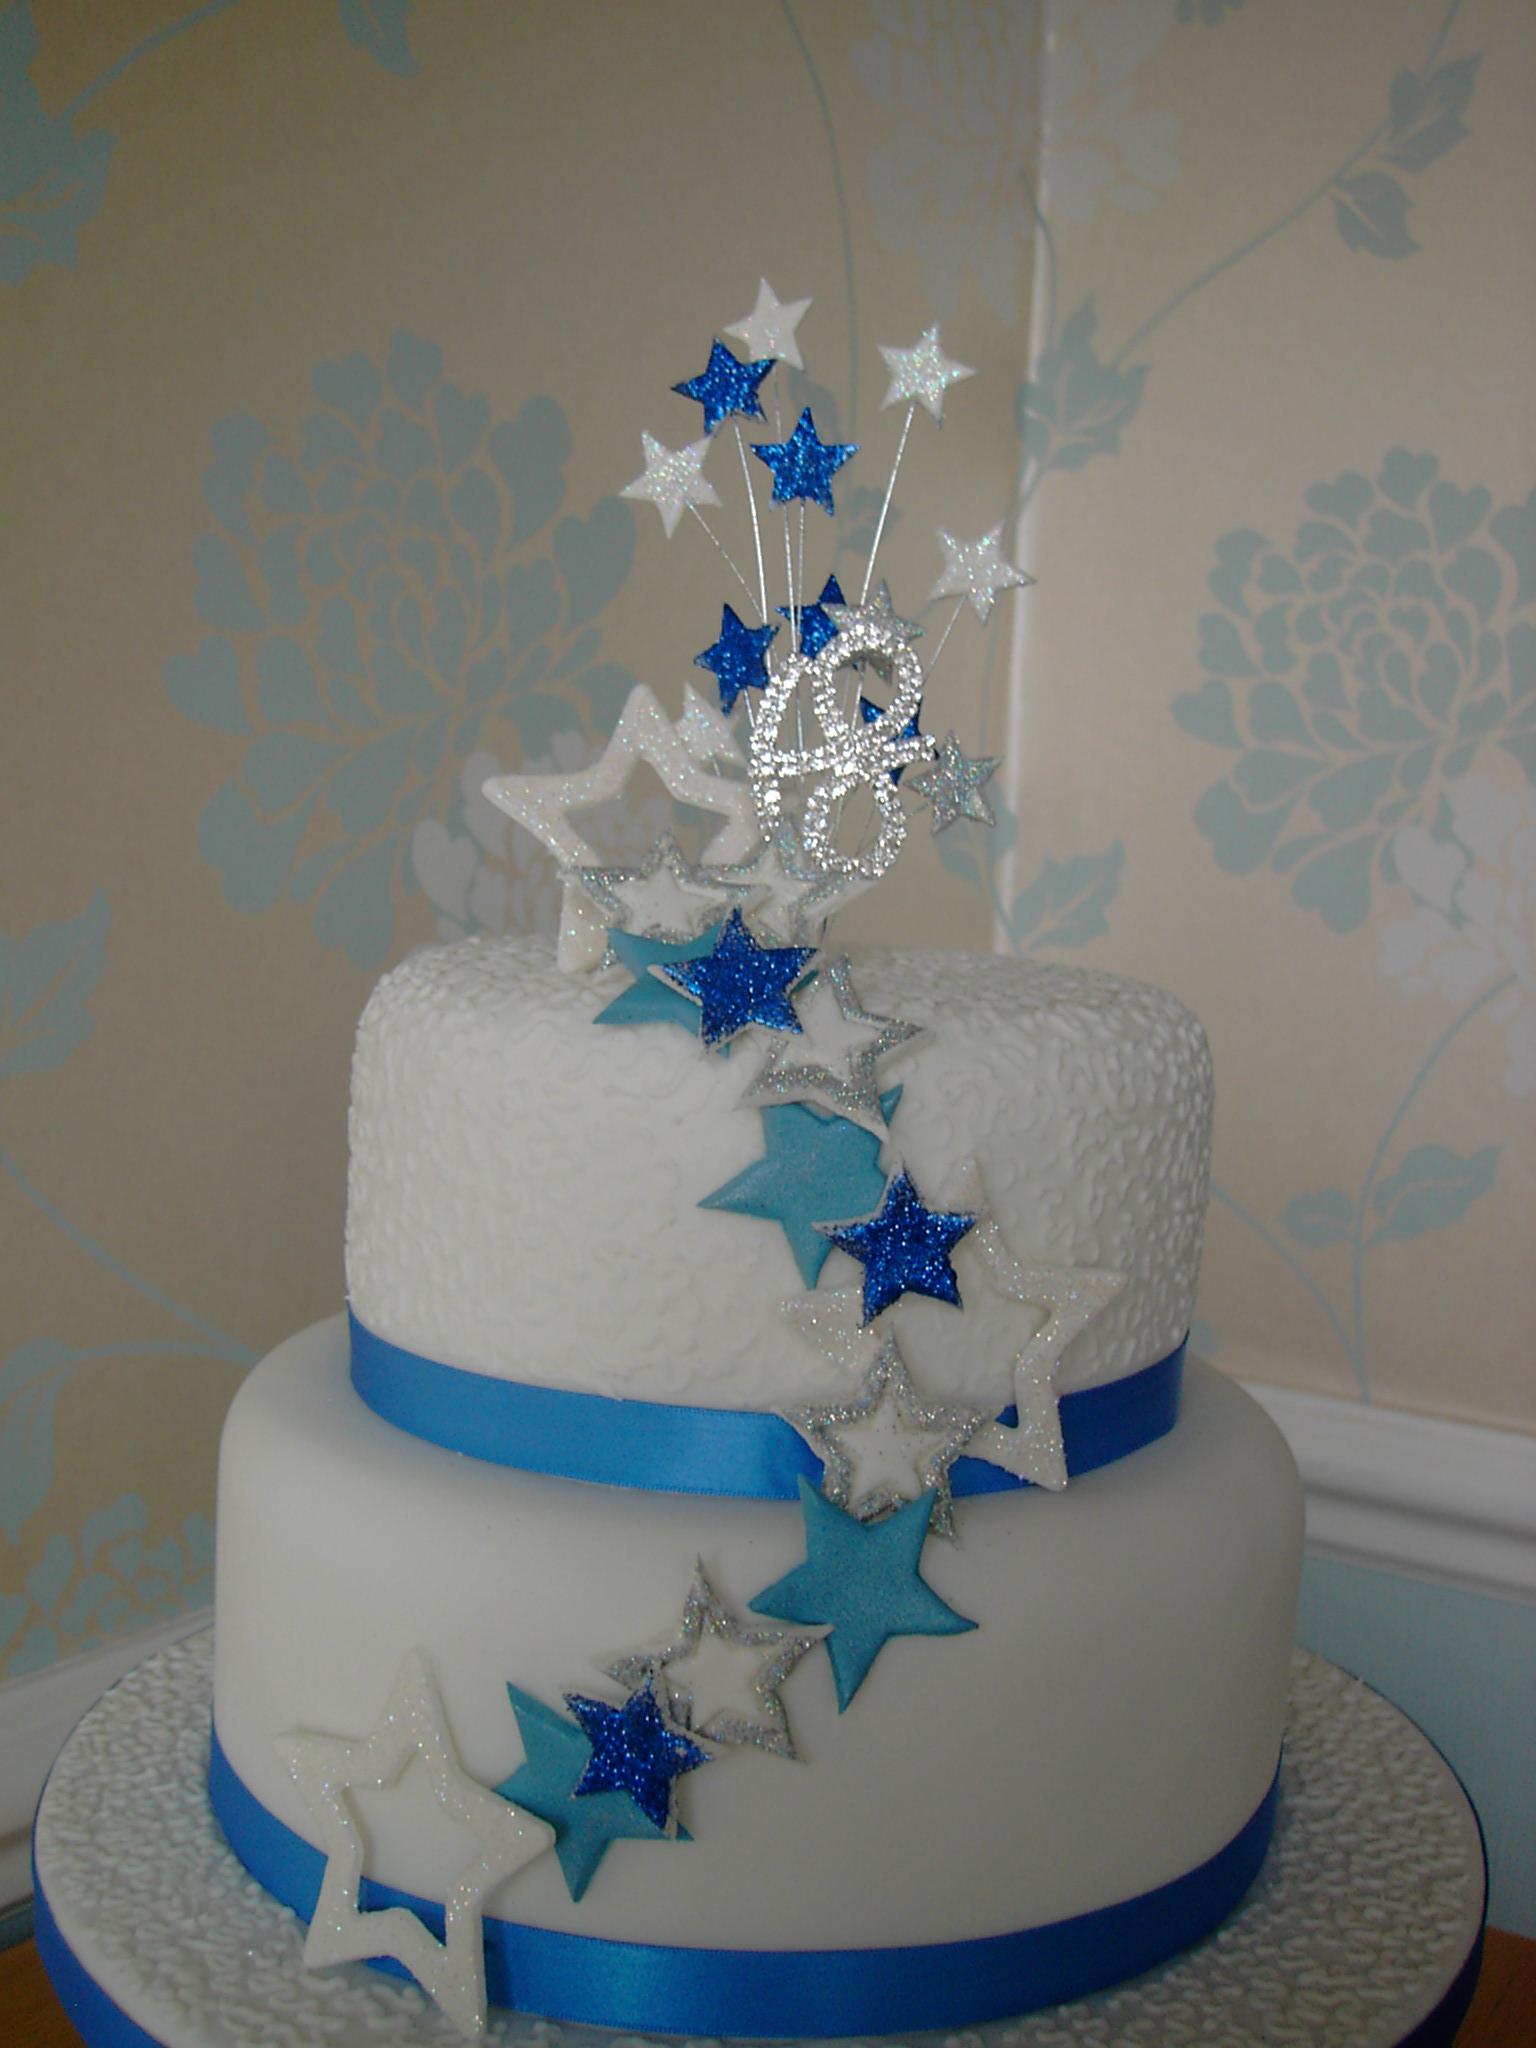 Ough What a Cake 4 Birthdays